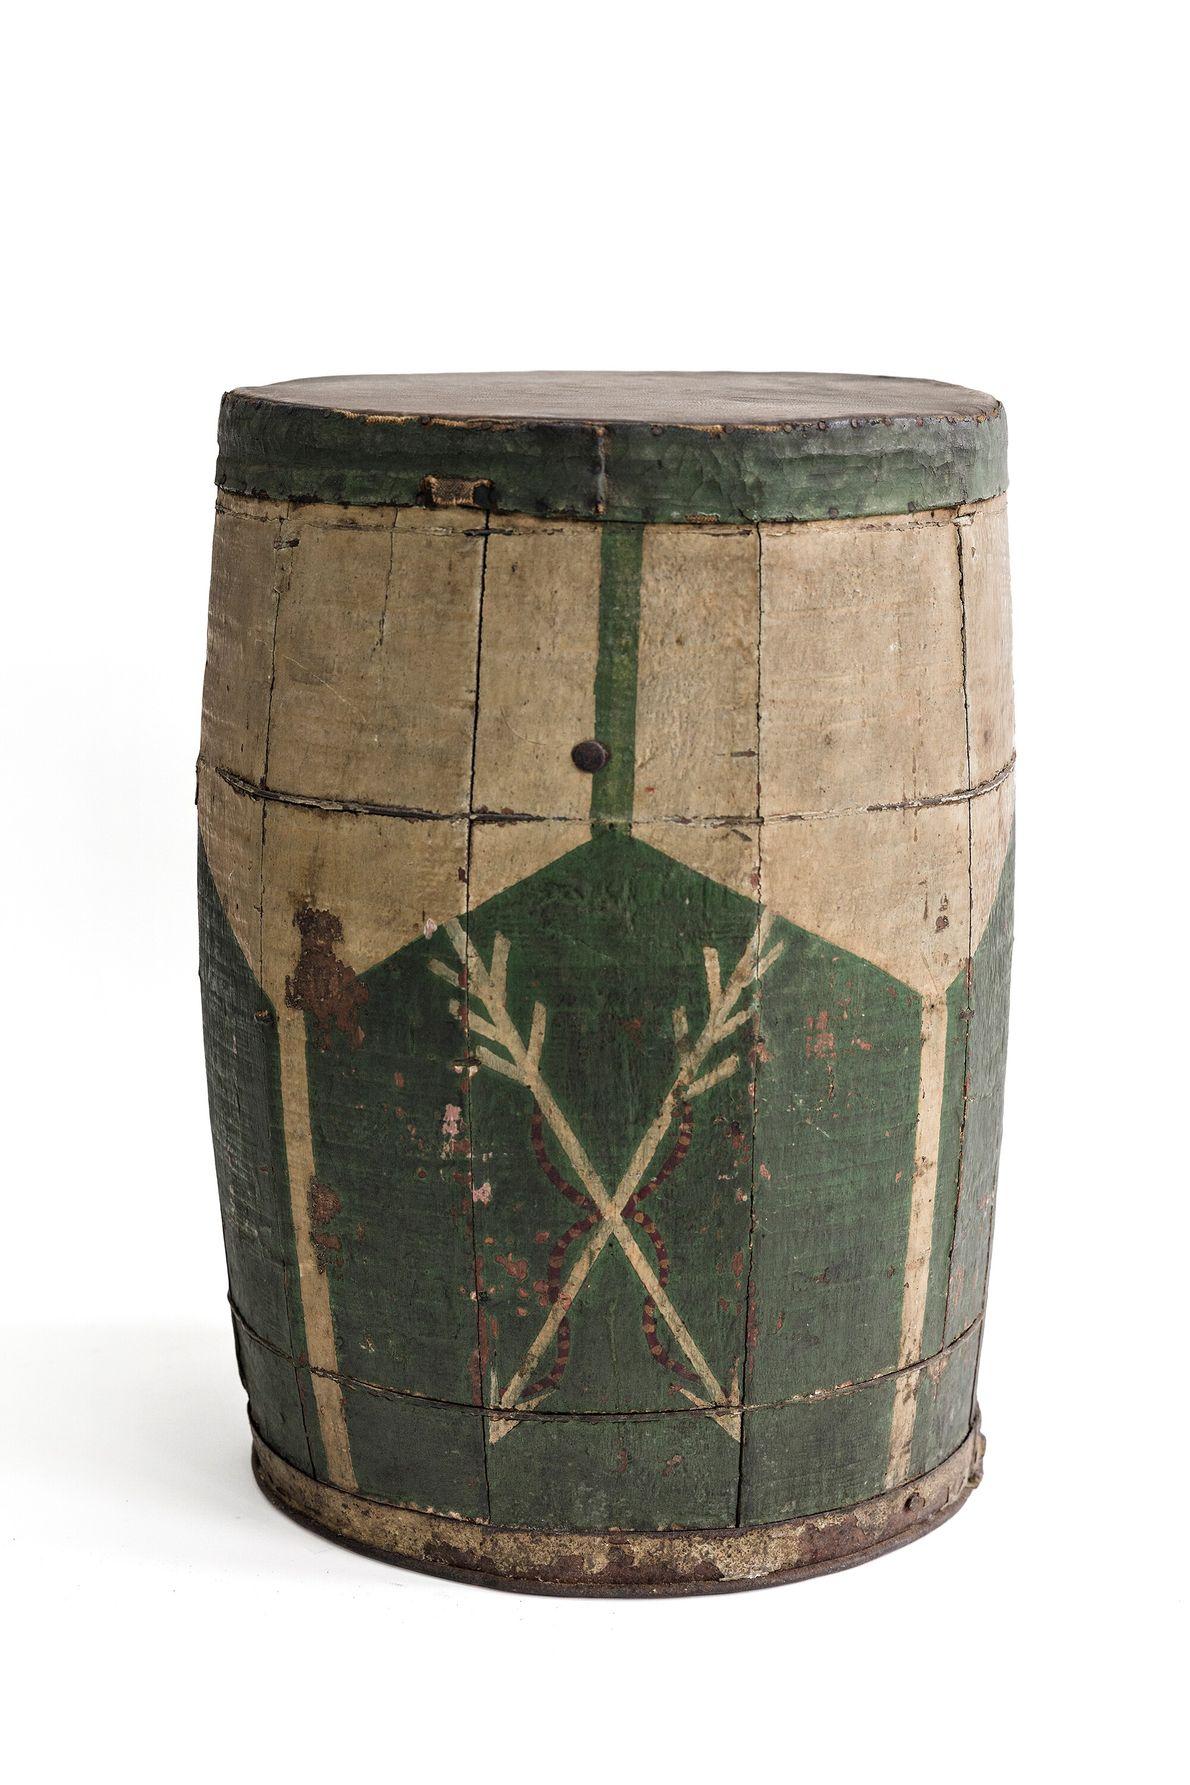 Atabaque com pintura verde e branca e flechas relacionadas a Oxossí, orixá da caça e matas. ...